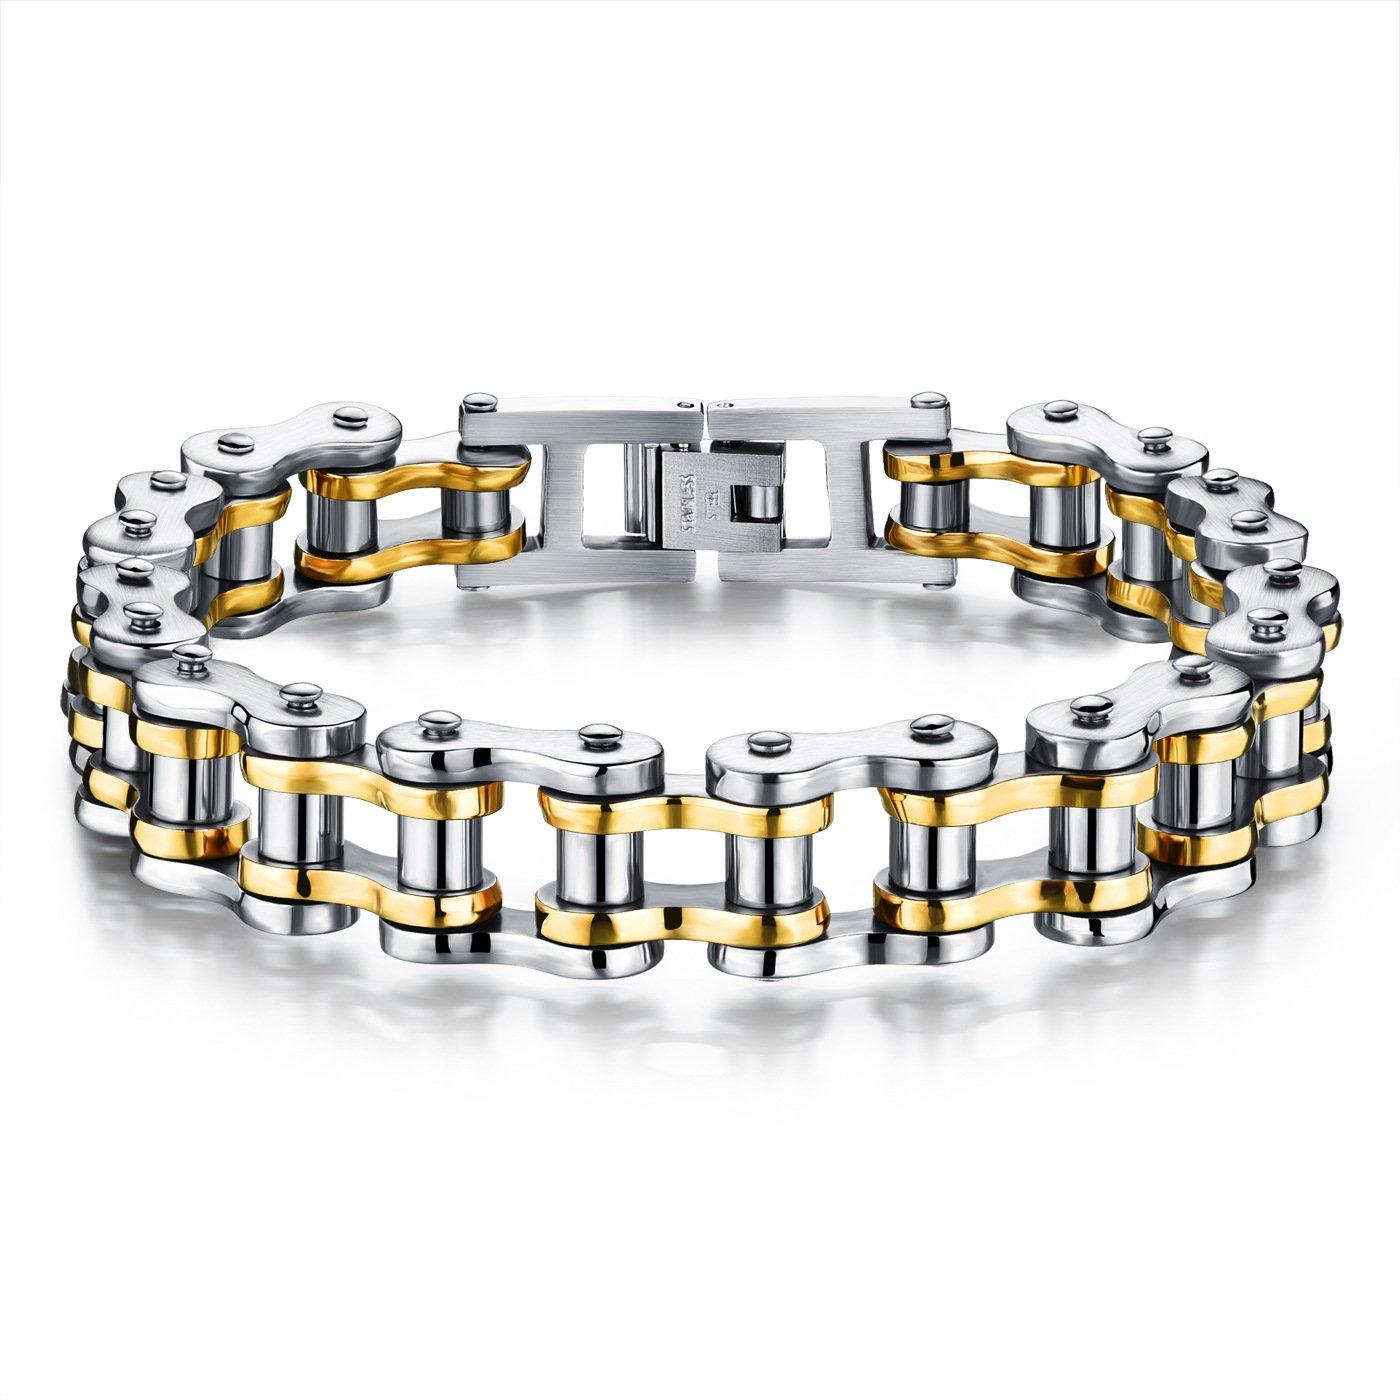 Star Jewelry Stainless Steel bike Chain Bracelet Punk Rock Link Wristband Chain Bracelets Bangle 8.5 Inch tg187-s